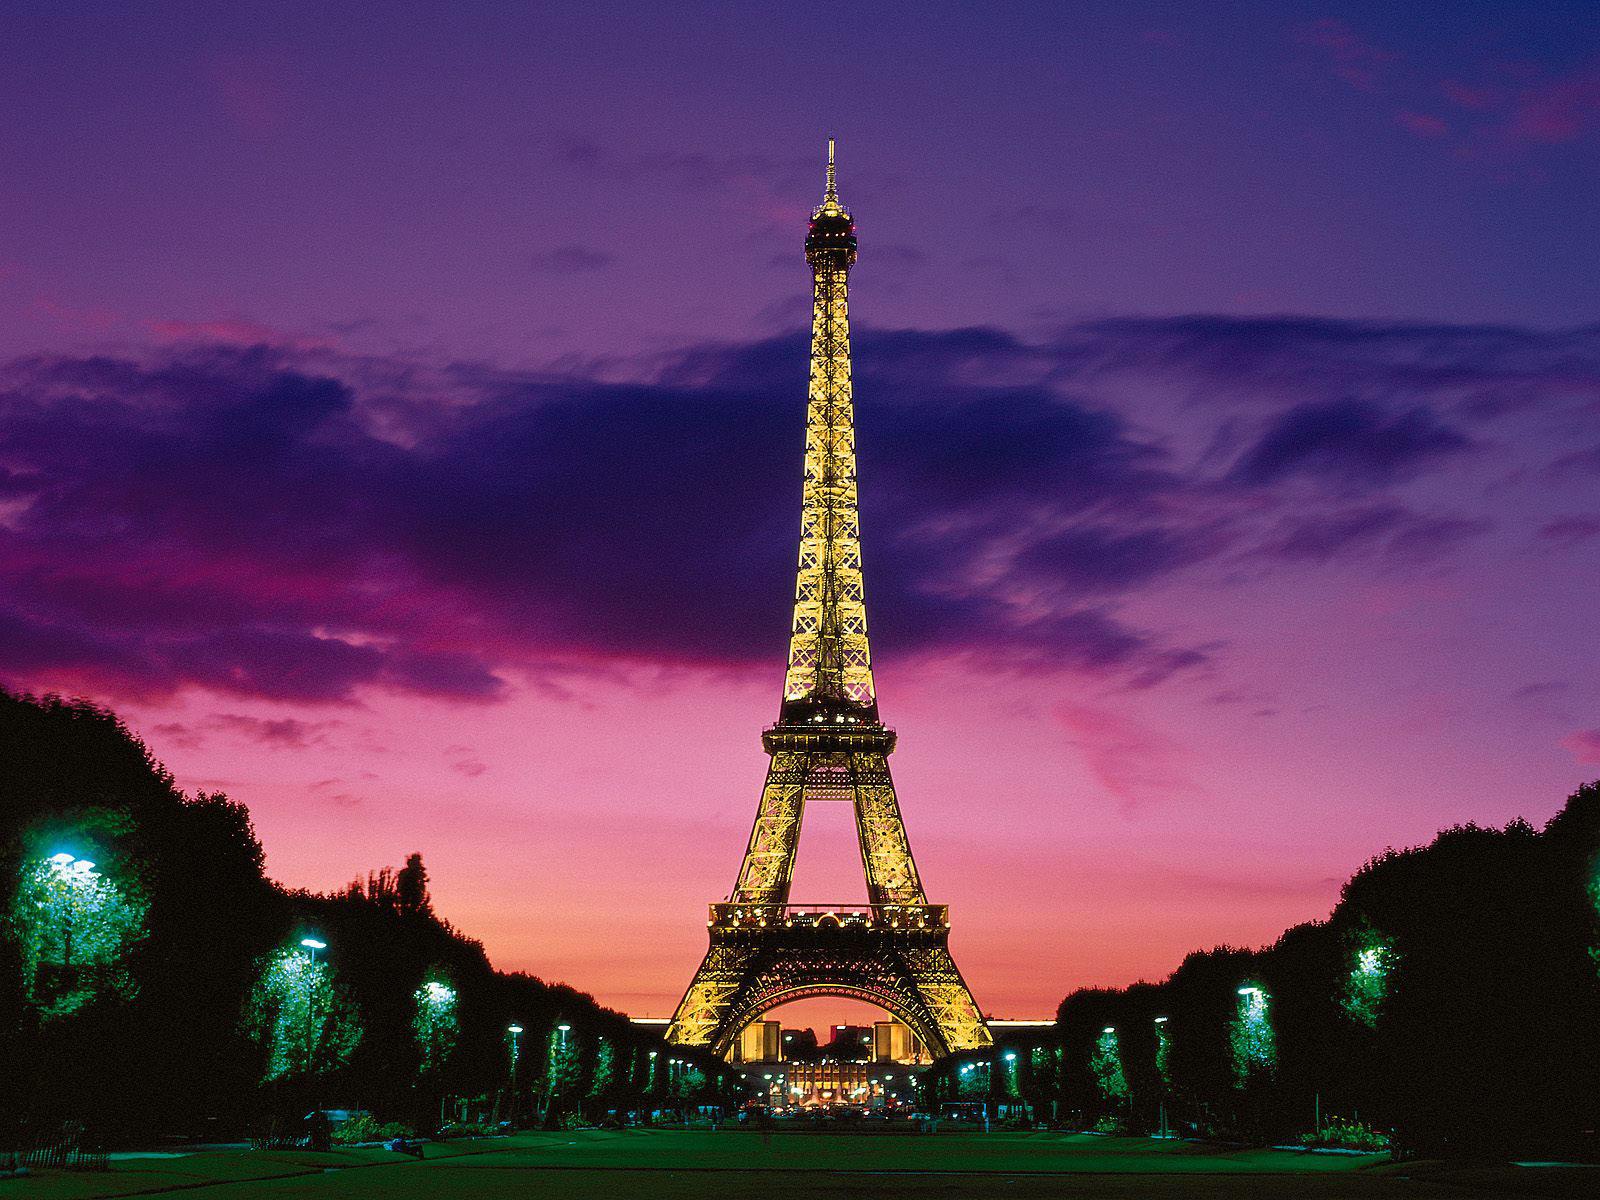 Eiffel Tower Wallpapers 1.jpg